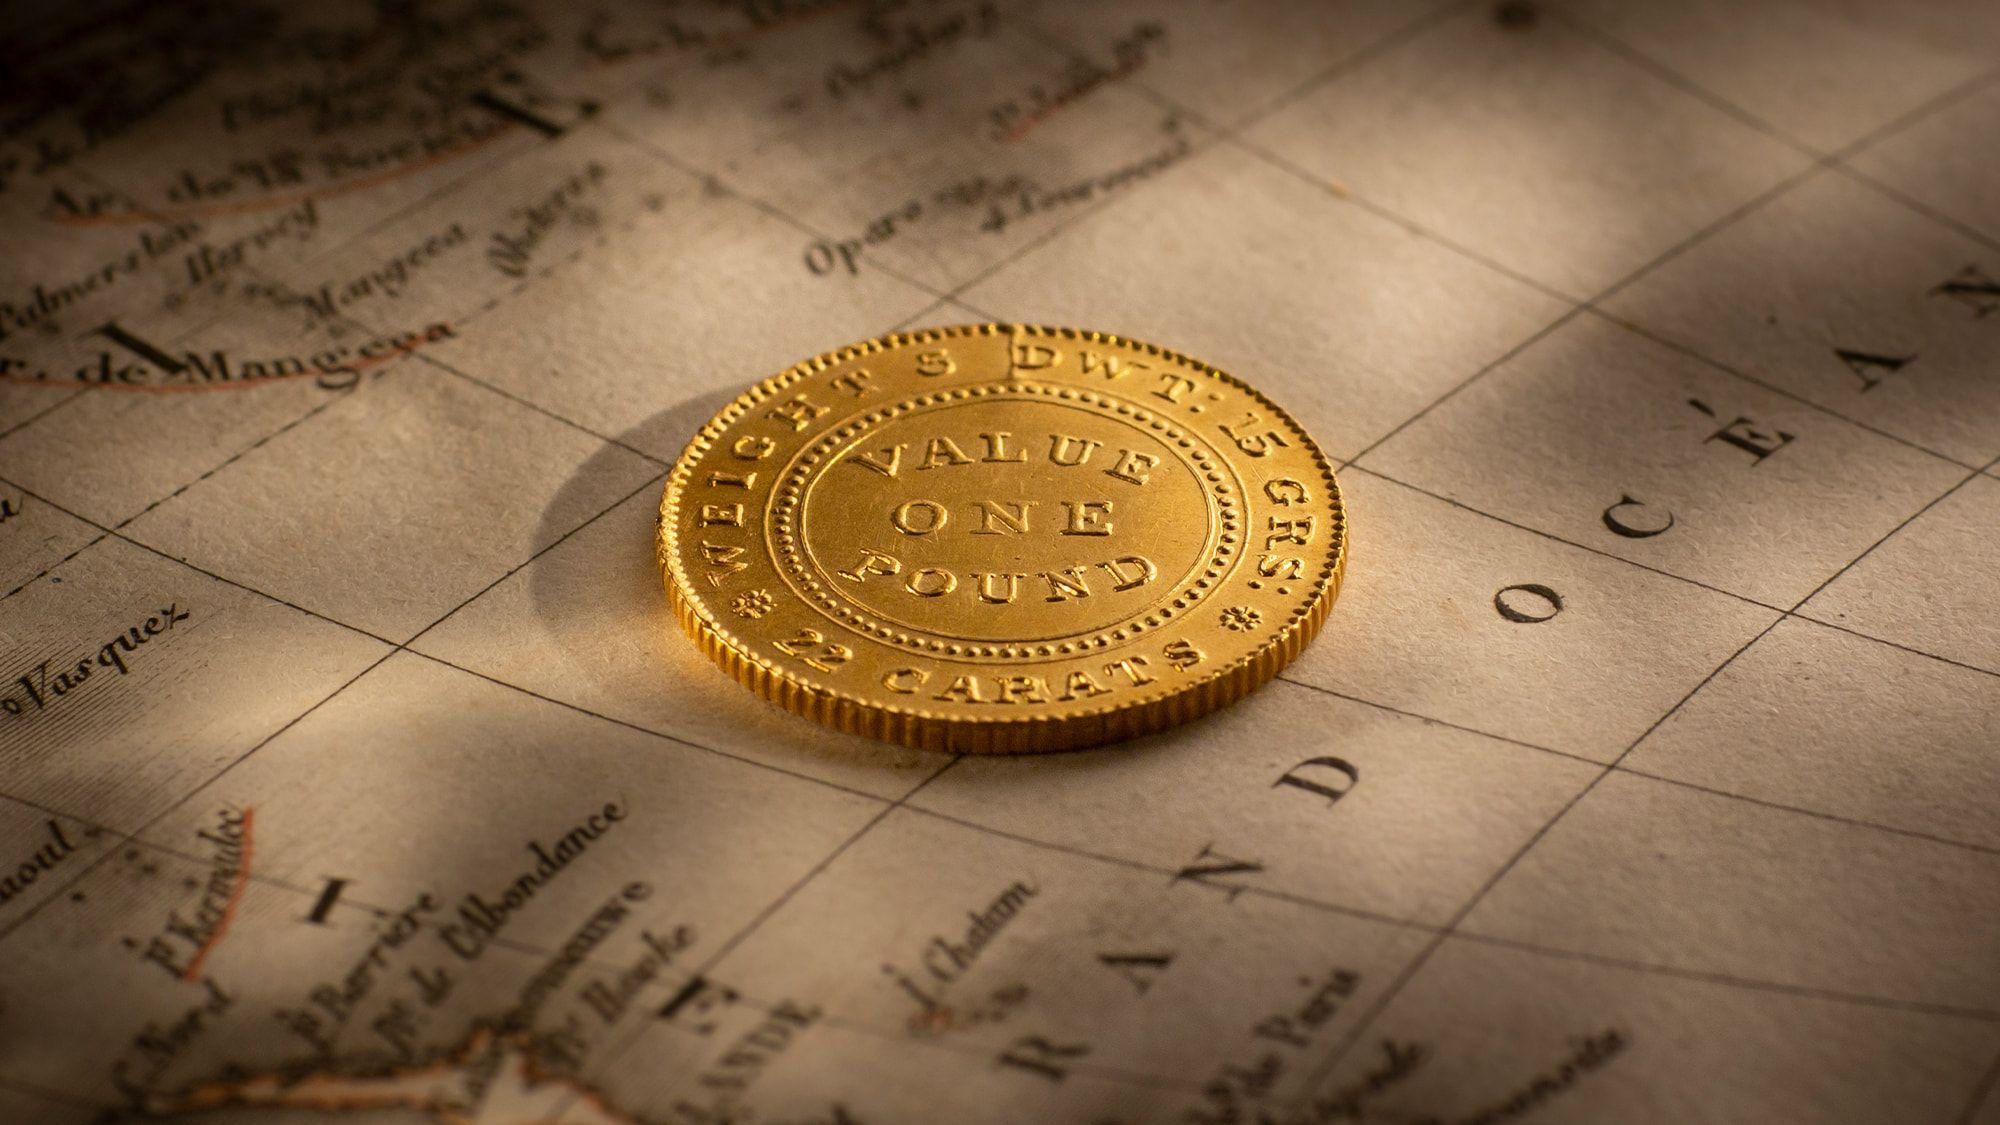 1852-Adelaide-Pound-Cracked-Die-Rev-July-2020